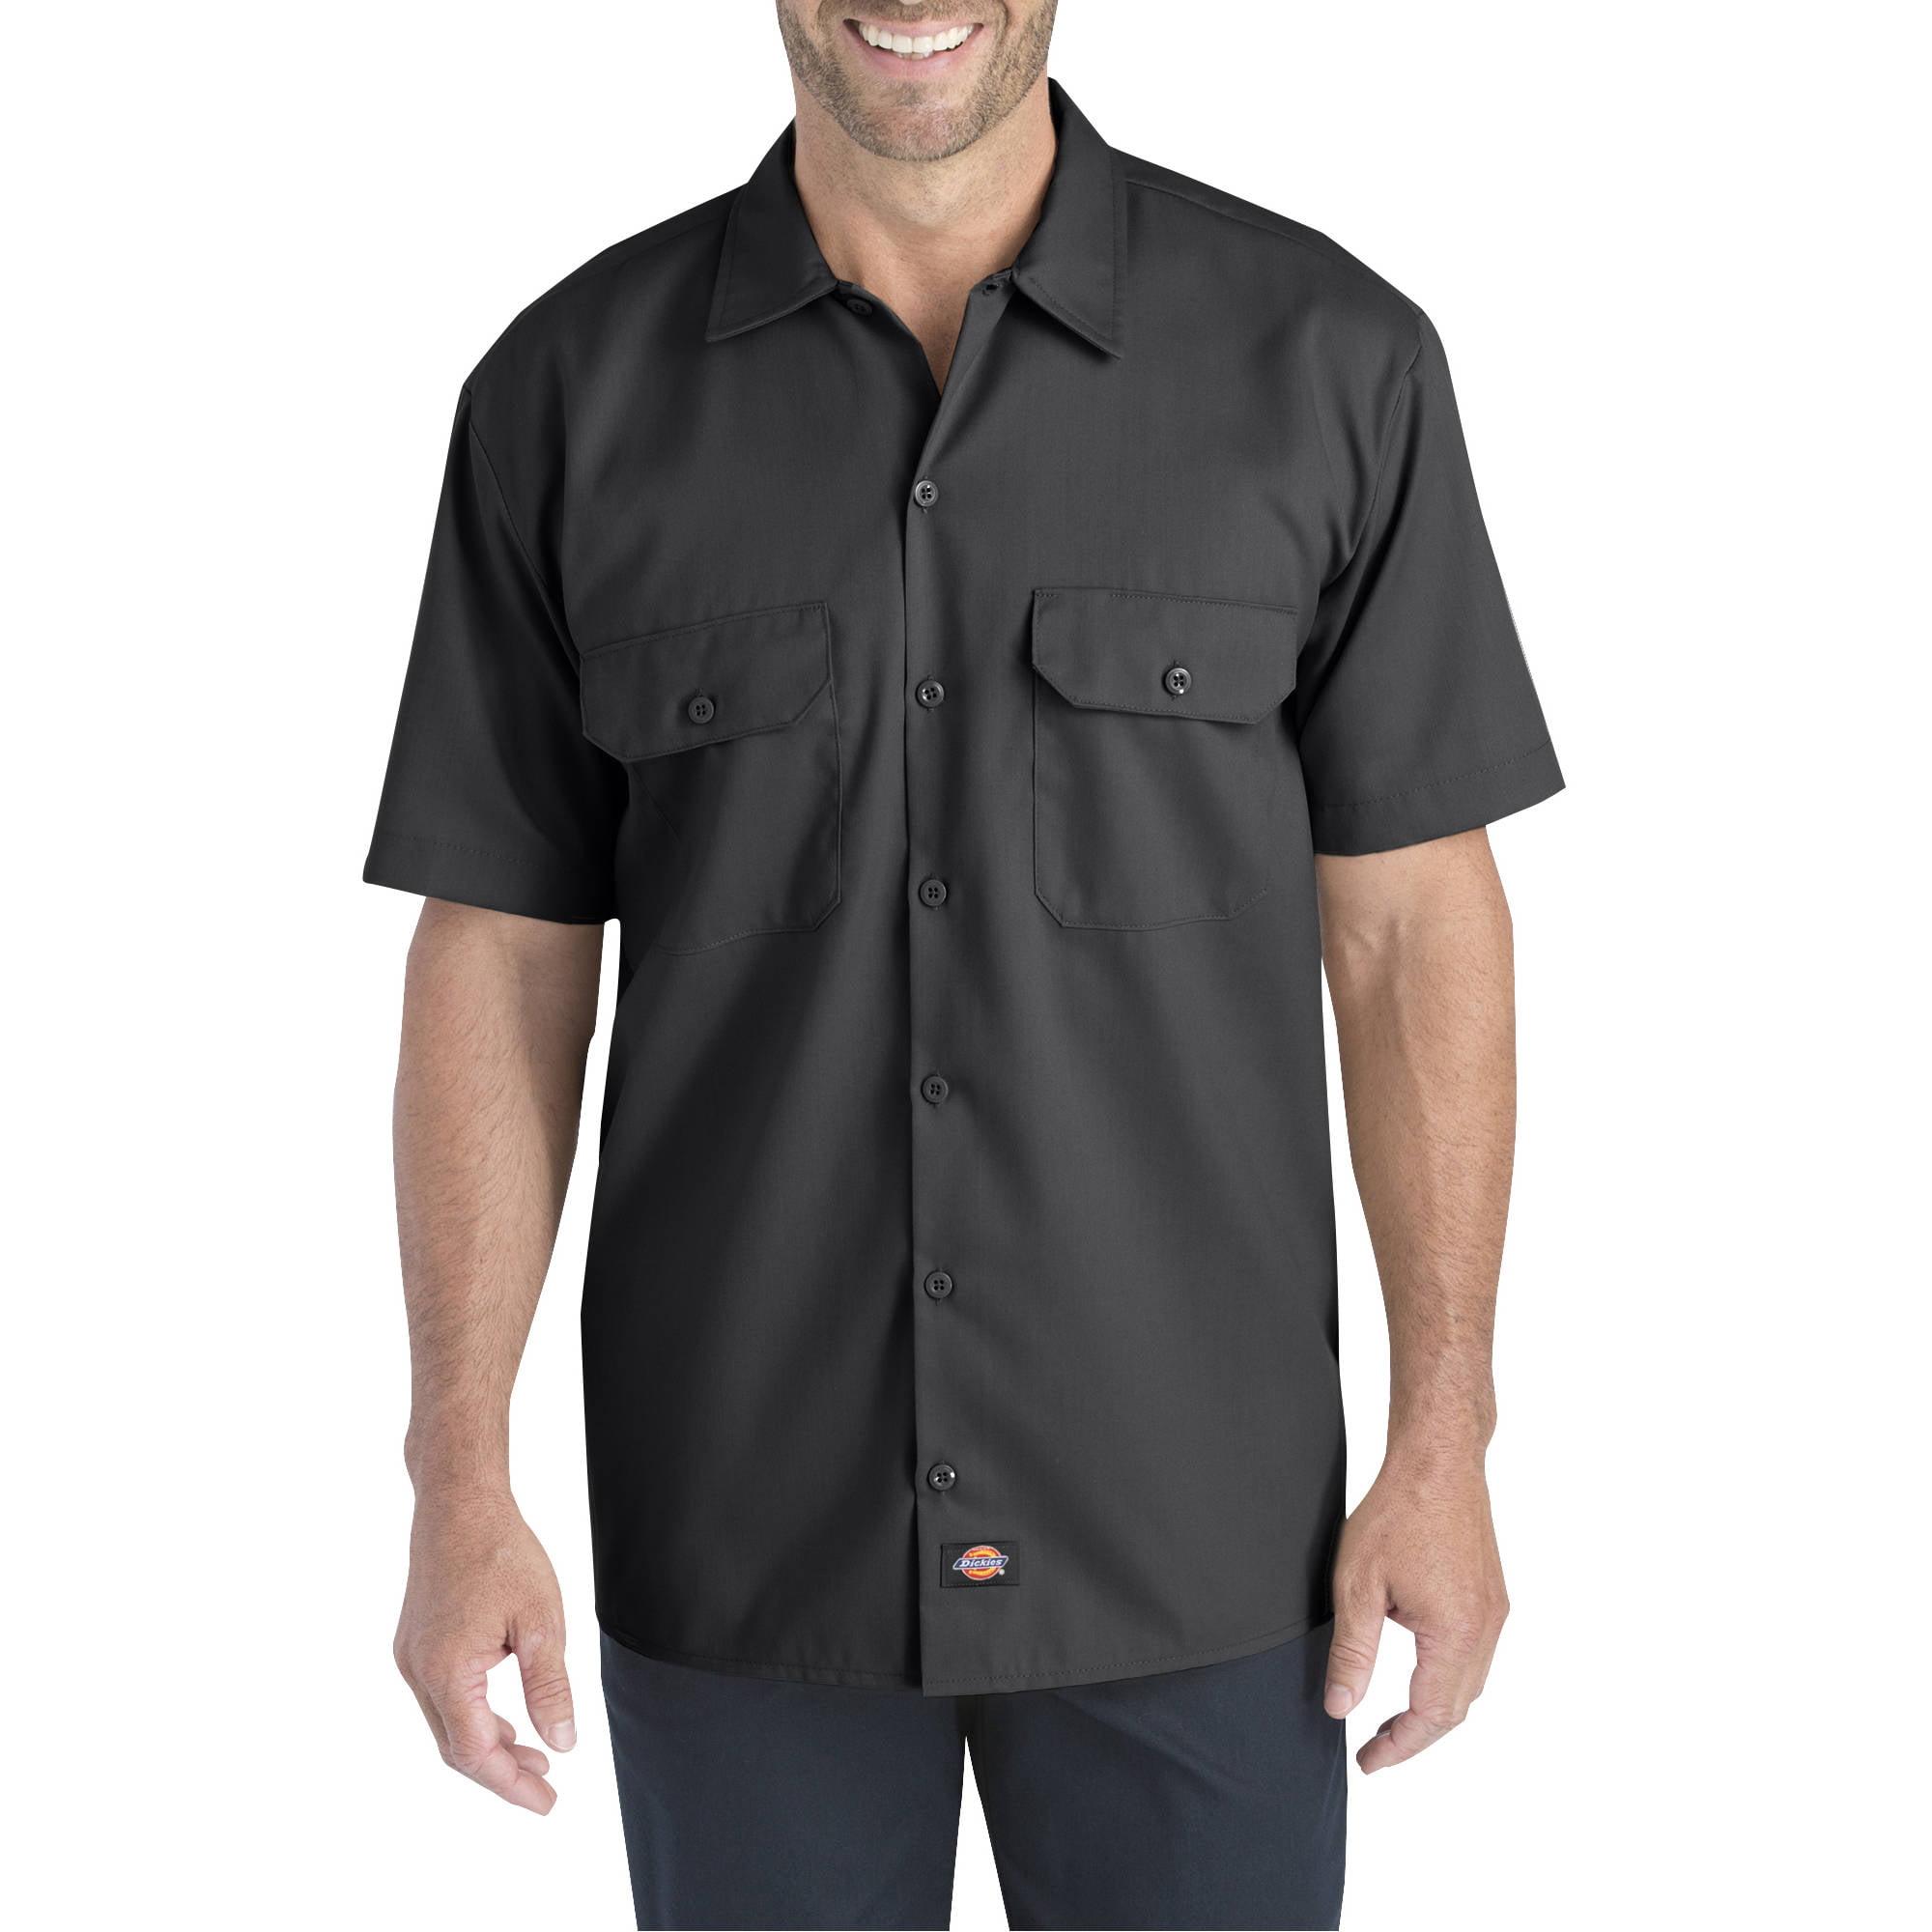 2506dcf313c02 Buy Short Sleeve Flex Twill Shirt